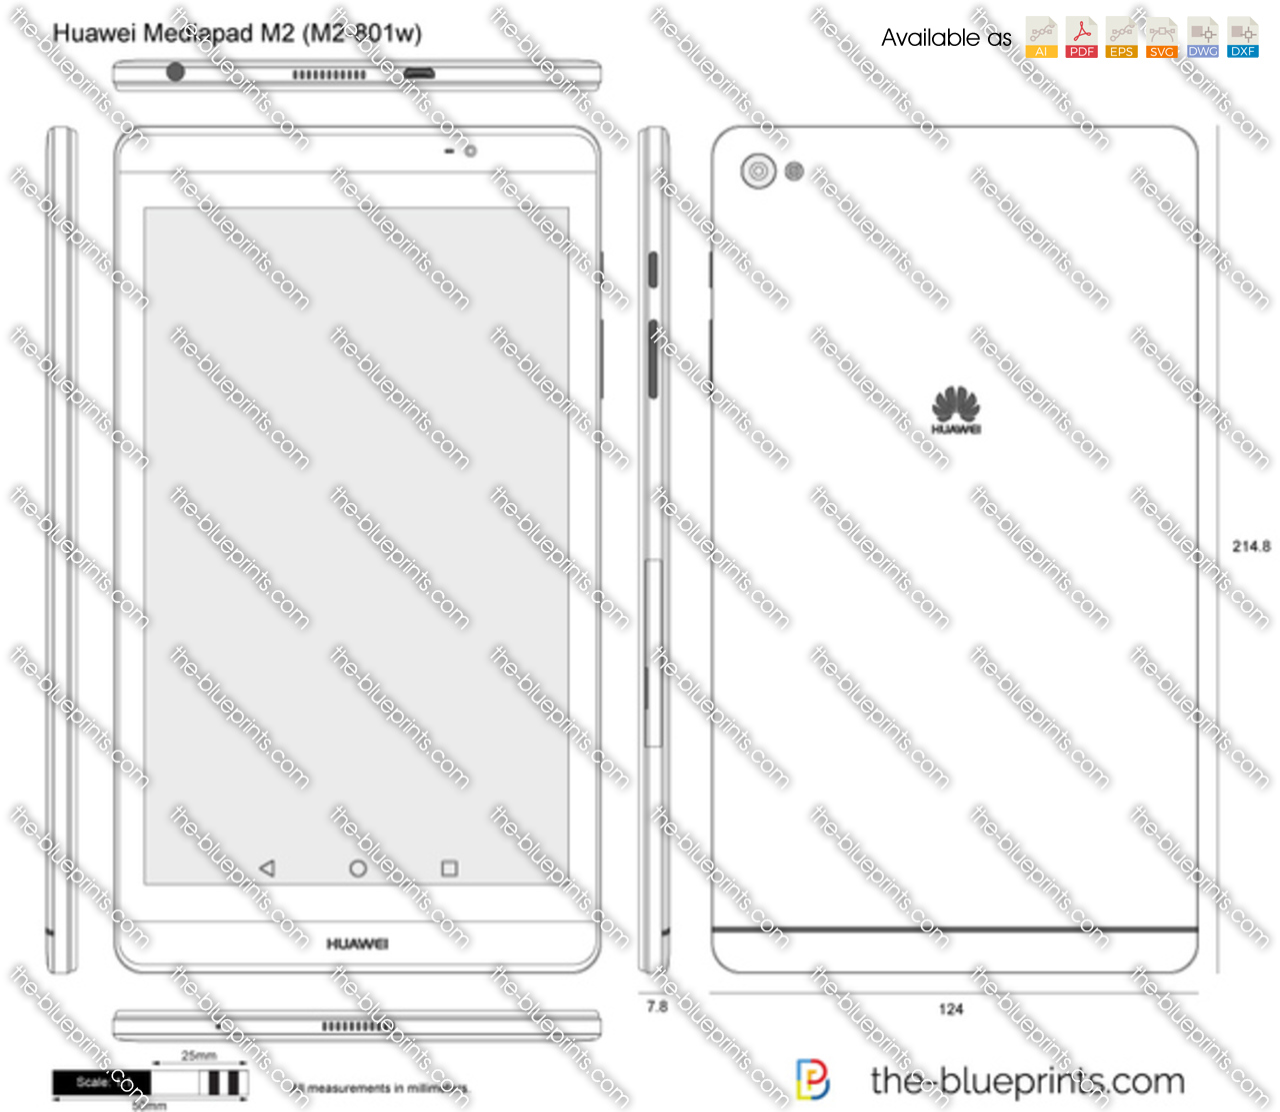 Huawei Mediapad M2 (M2-801w)